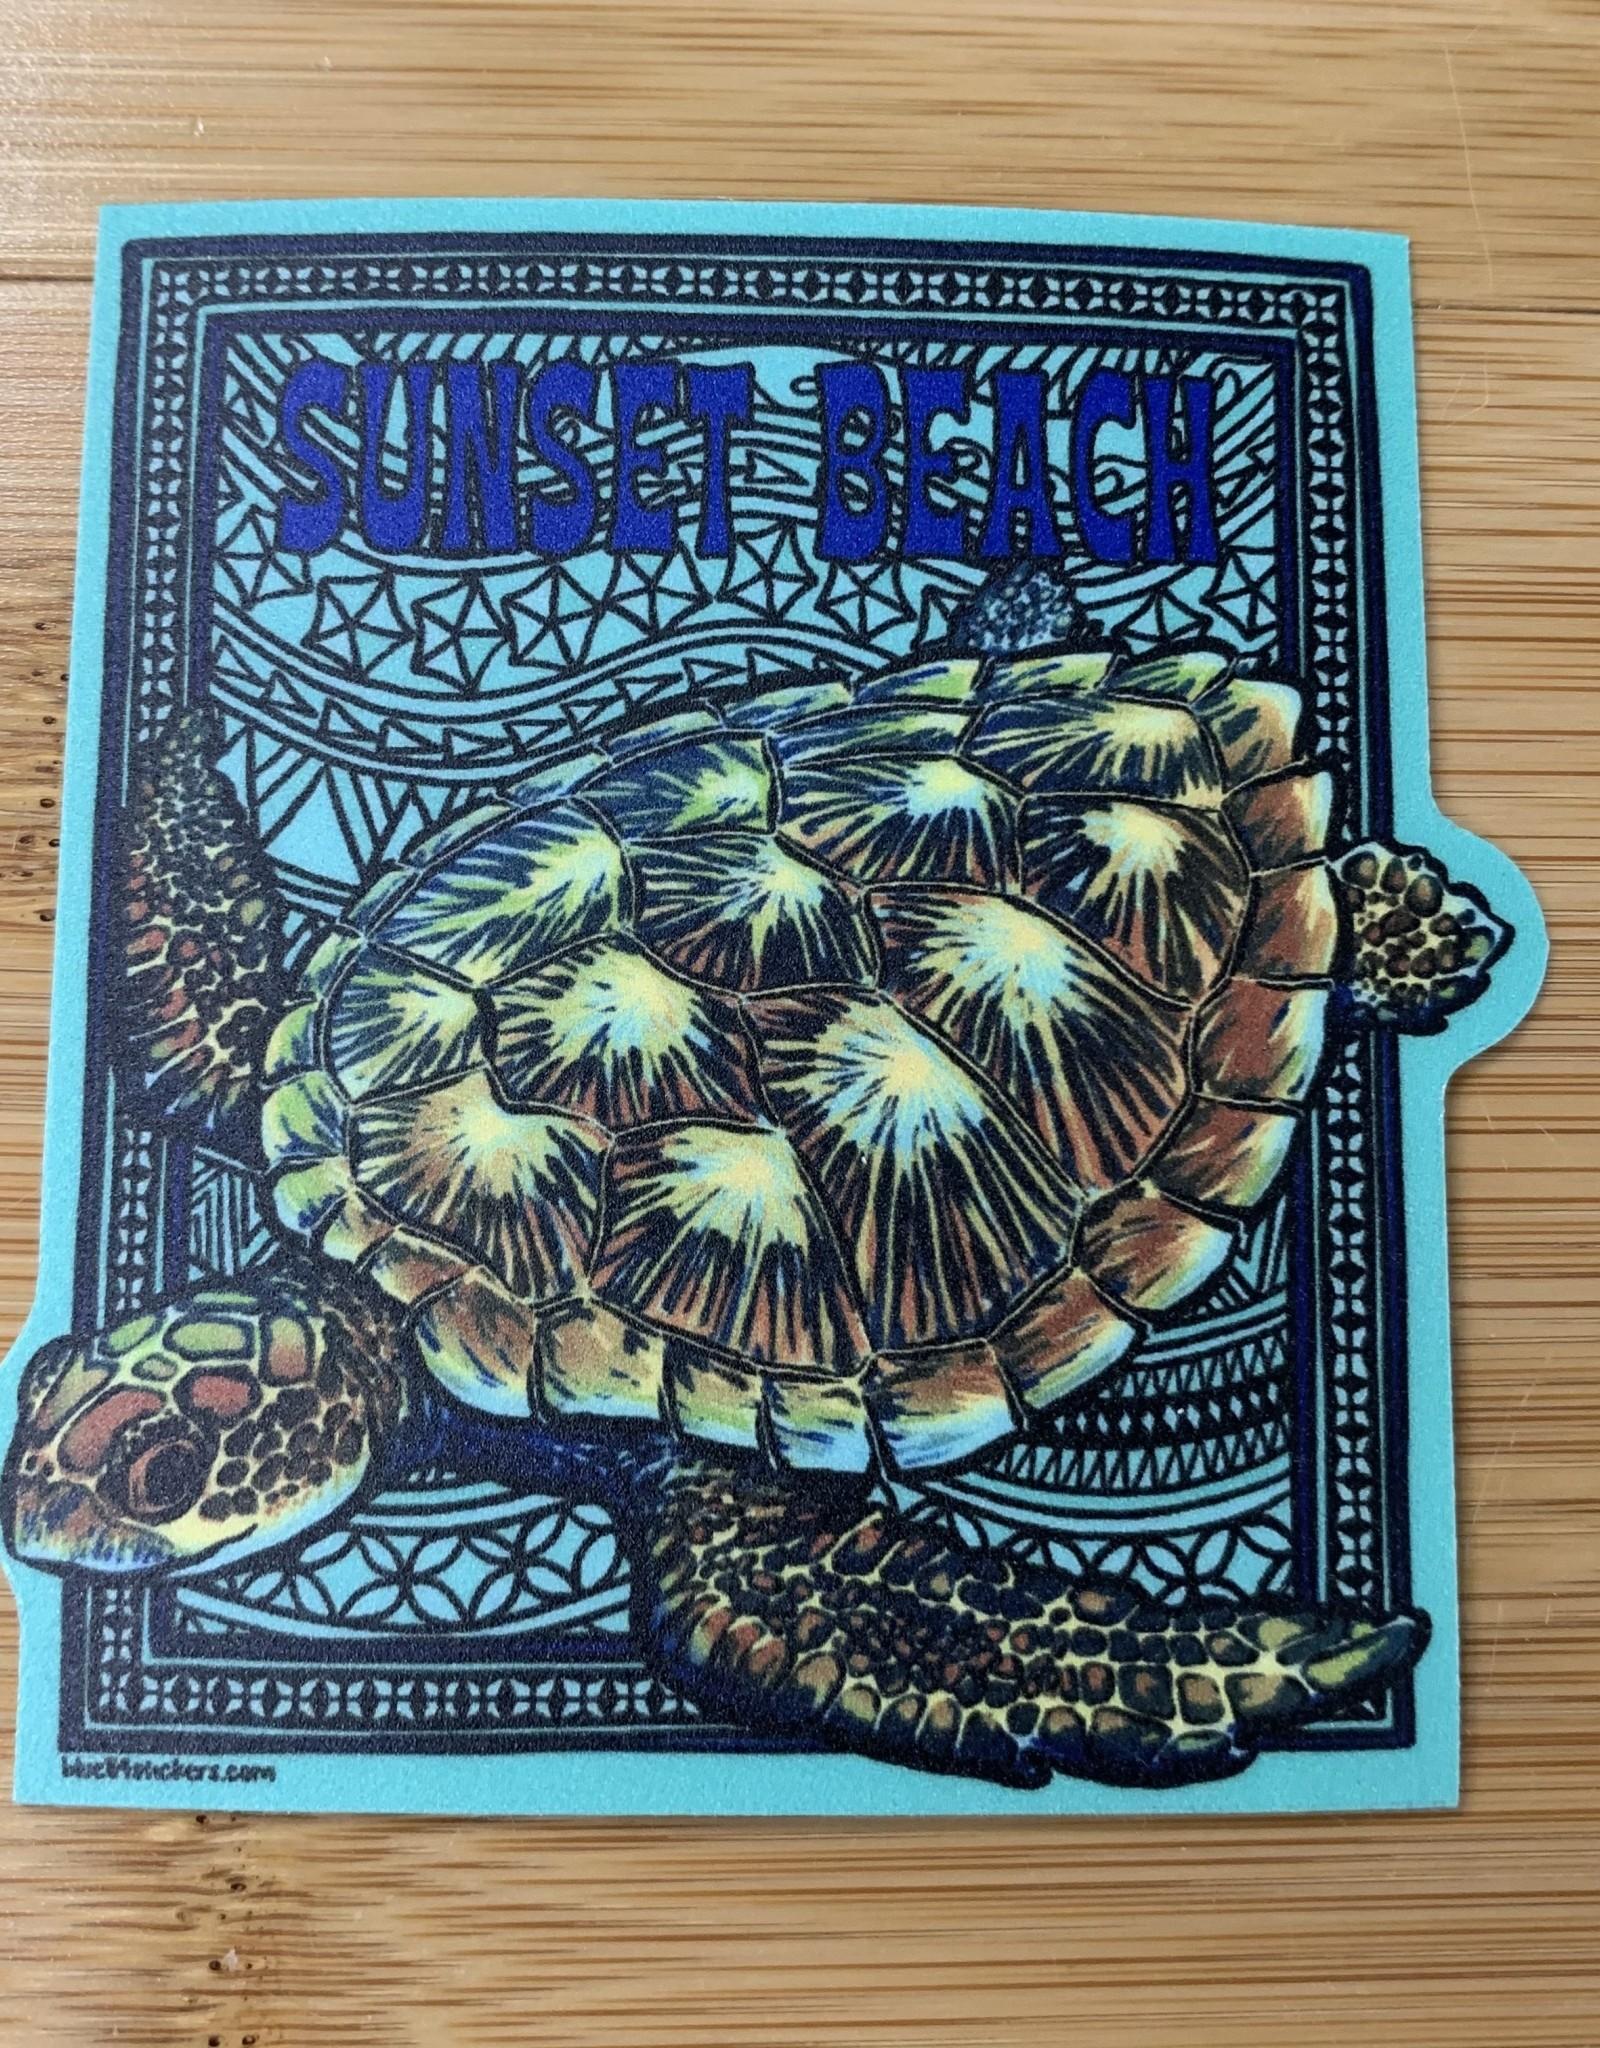 STICKER (L) MOSAIC SEA TURTLE